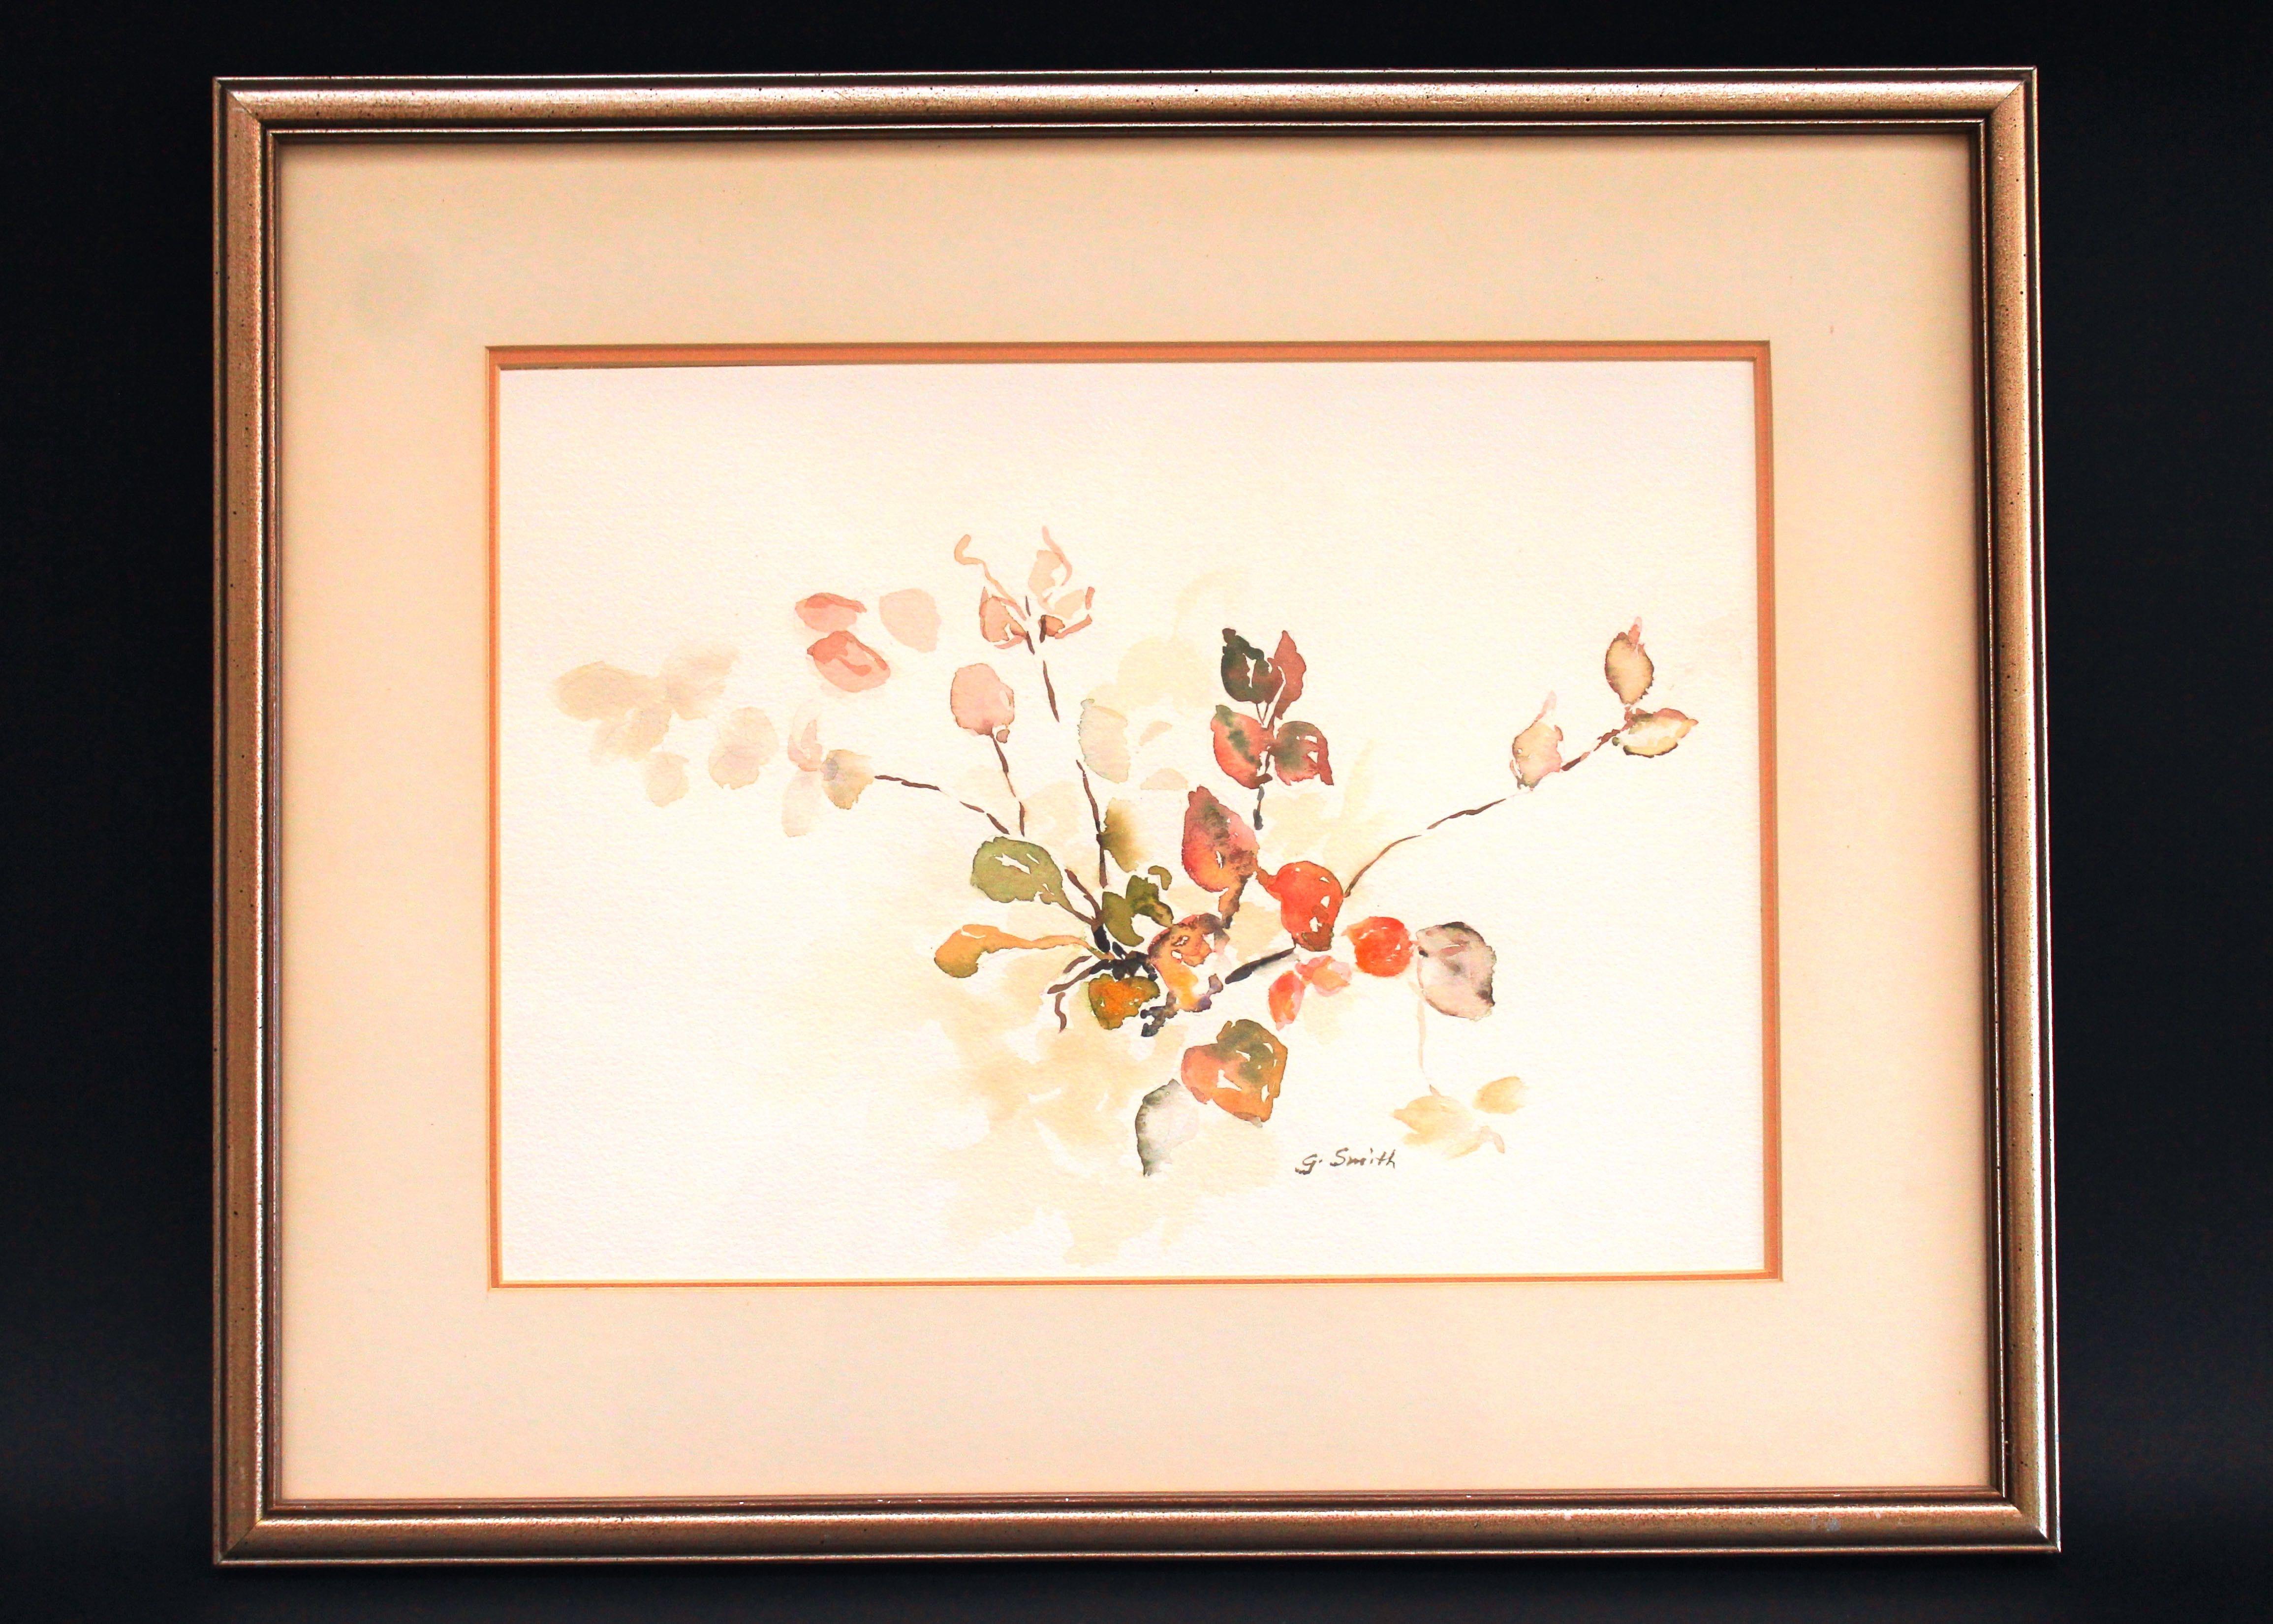 Original Watercolor By Sanibel Artist Gail Smith Ebth